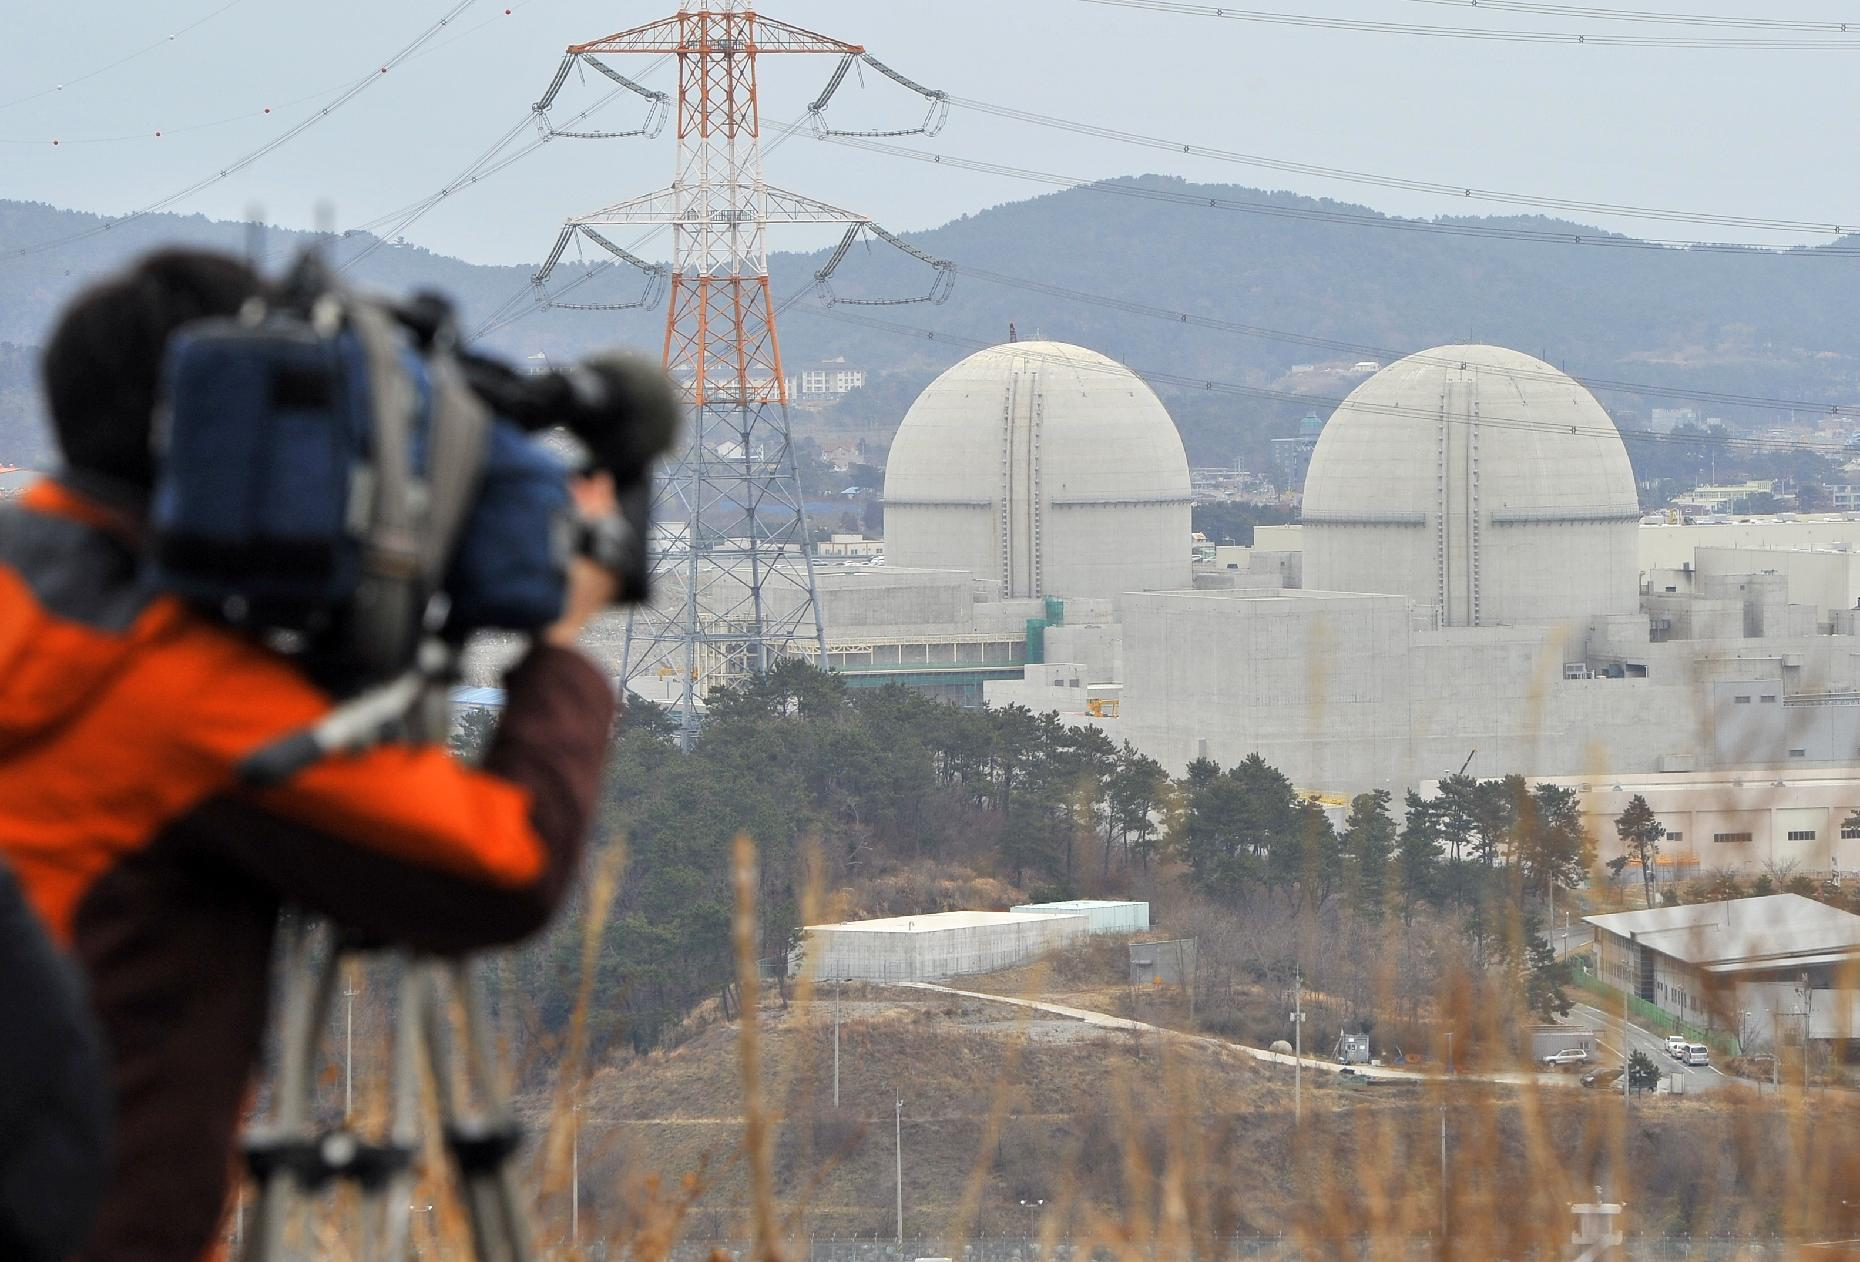 Gas leak kills three at S. Korea nuclear plant